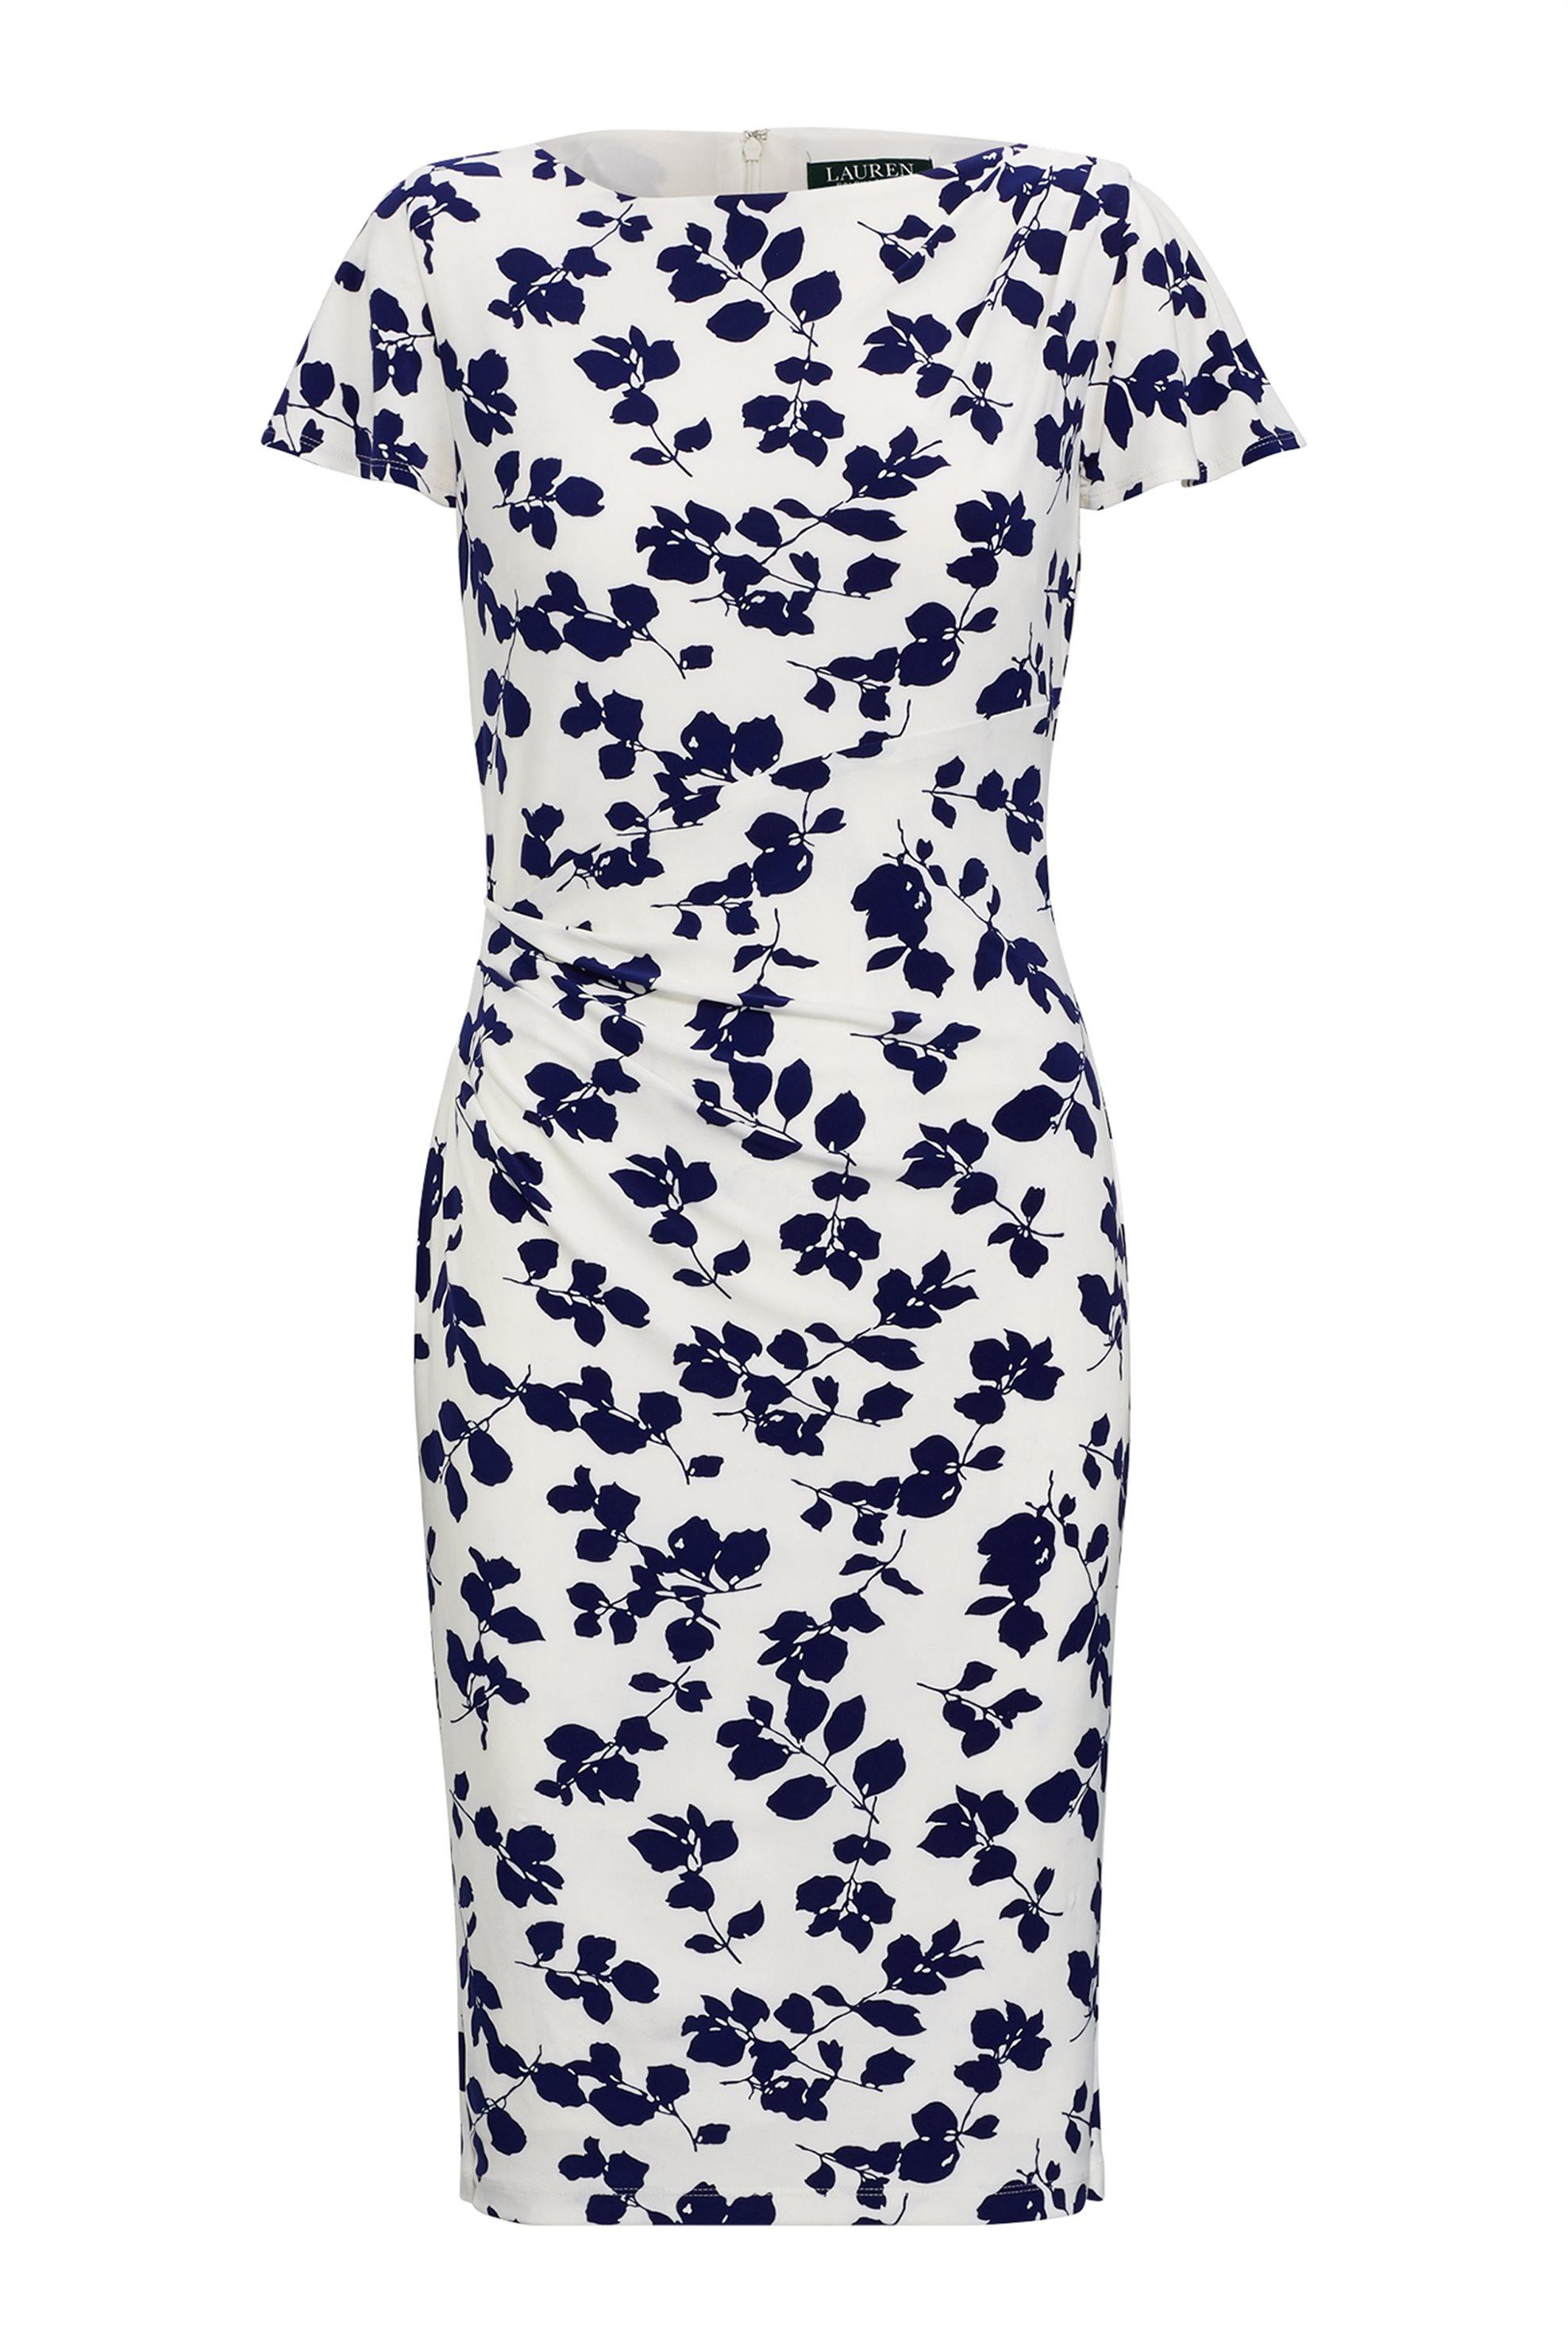 Lauren Ralph Lauren γυναικείo floral φόρεμα με σούρες - 250731371001 - Λευκό